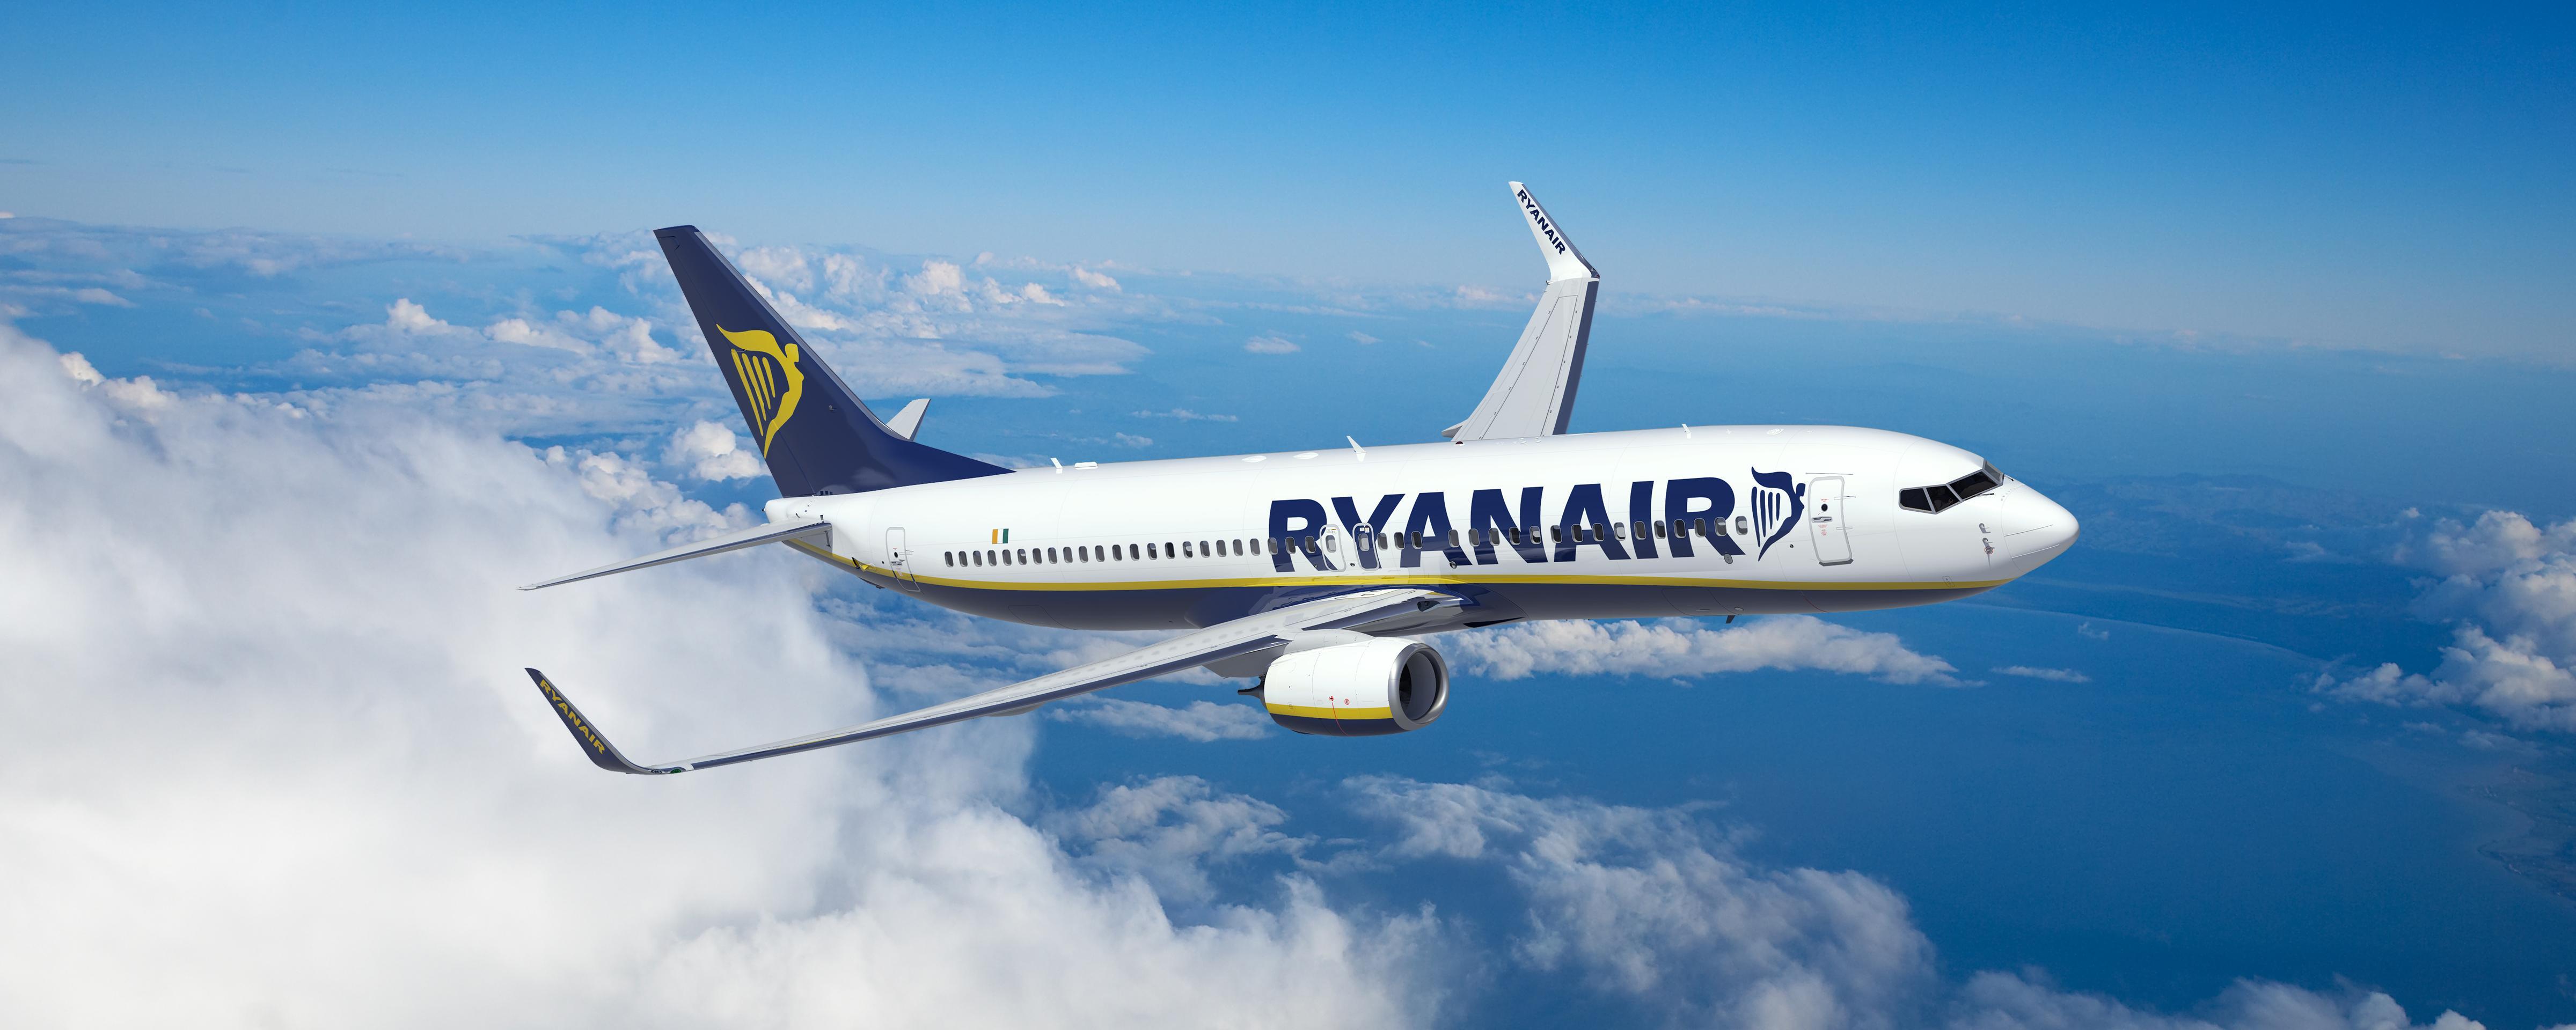 BiH: Ryanair returns to Banja Luka airport